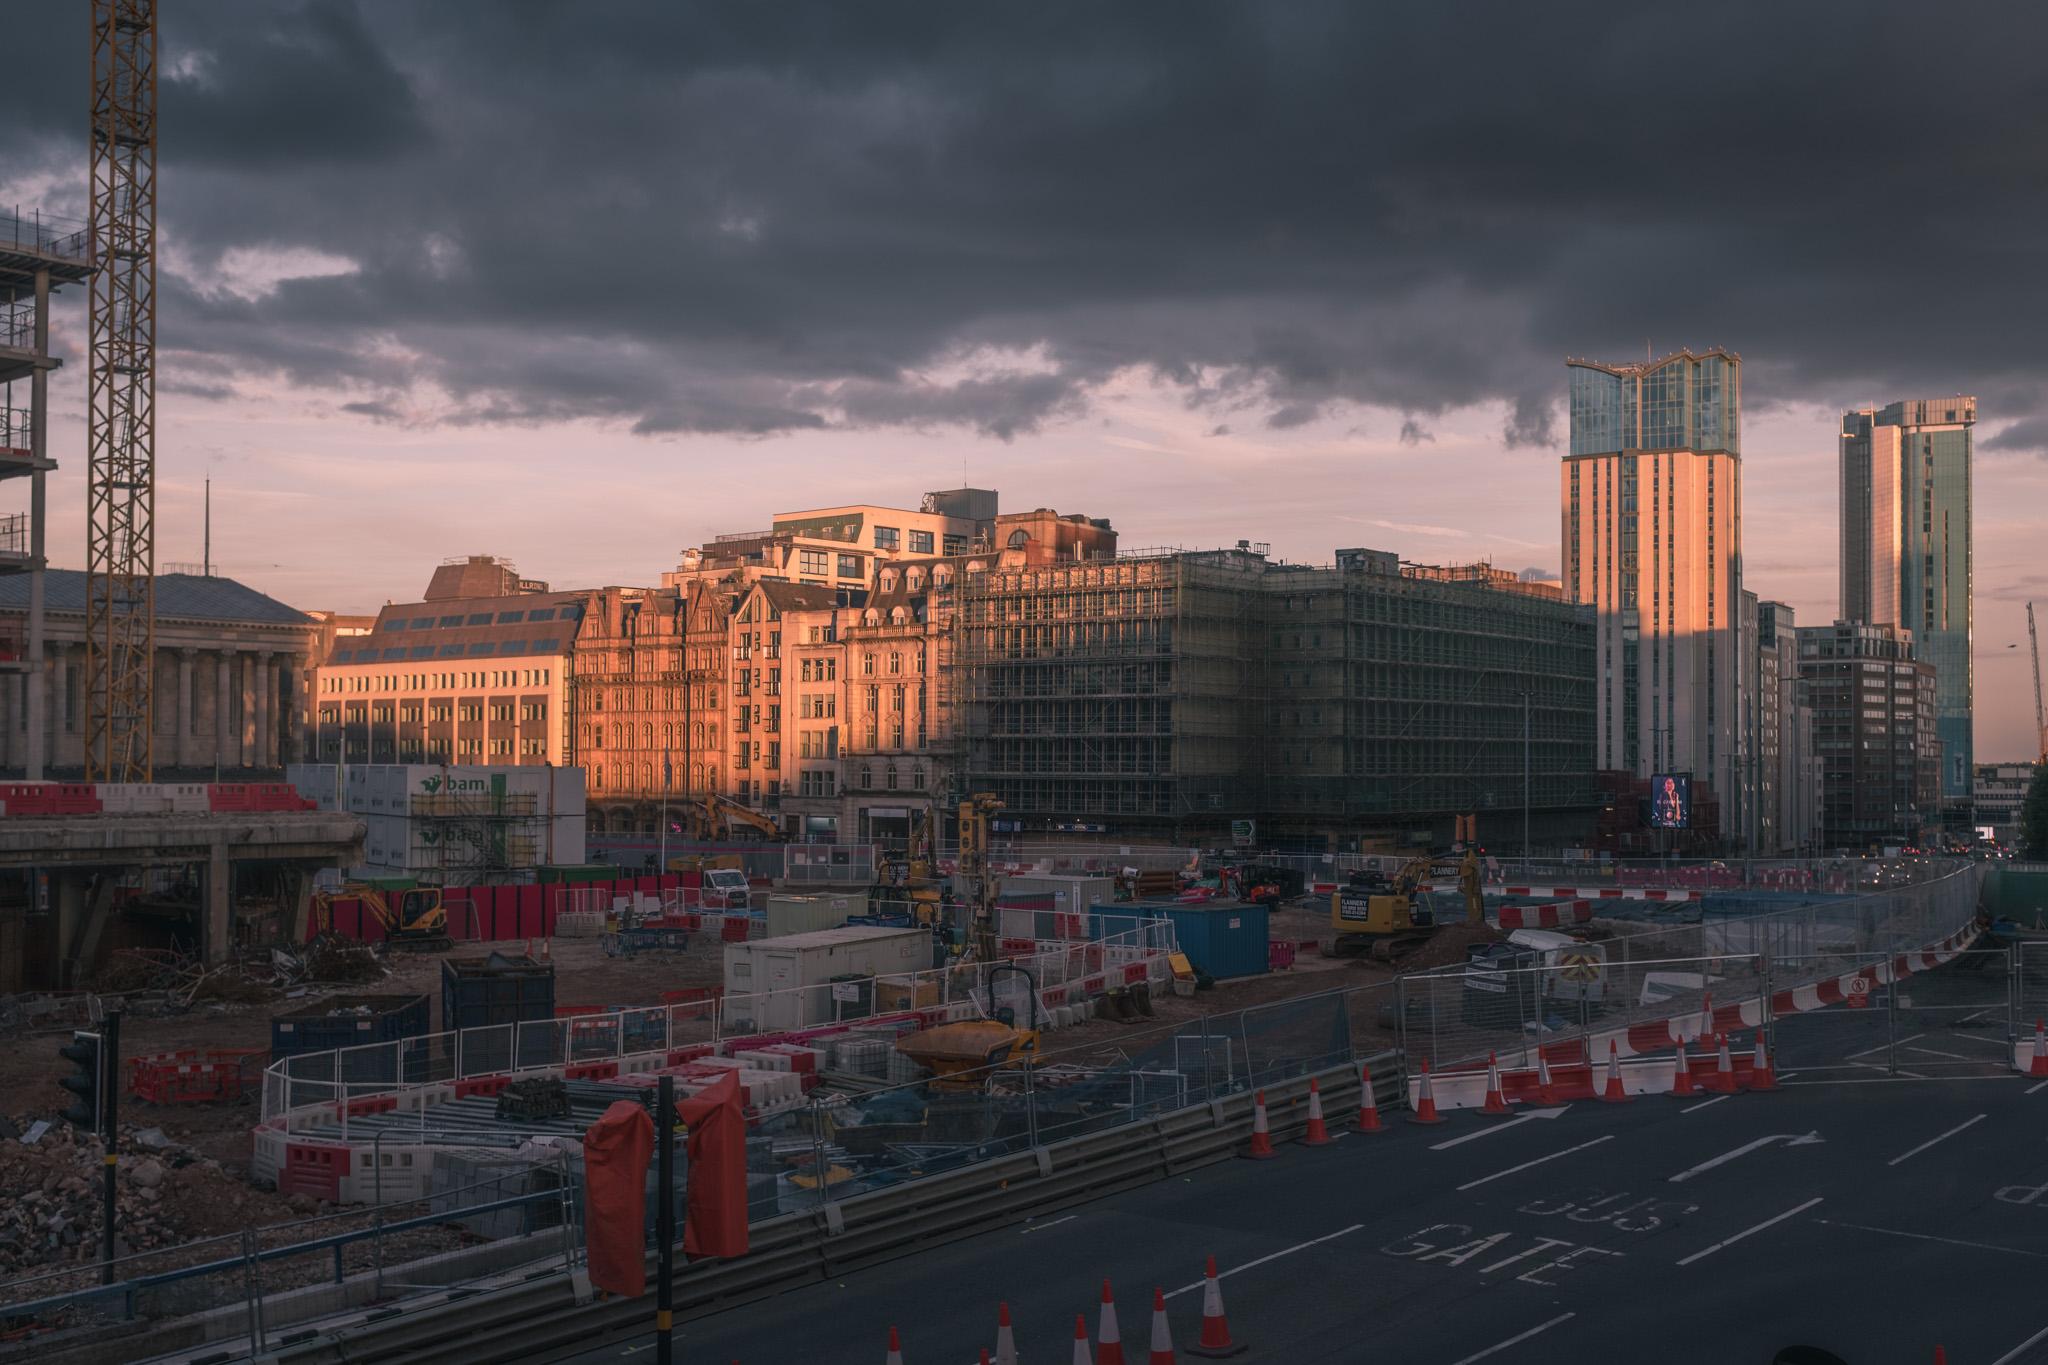 Ross Jukes Photography Birmingham-5109.jpg